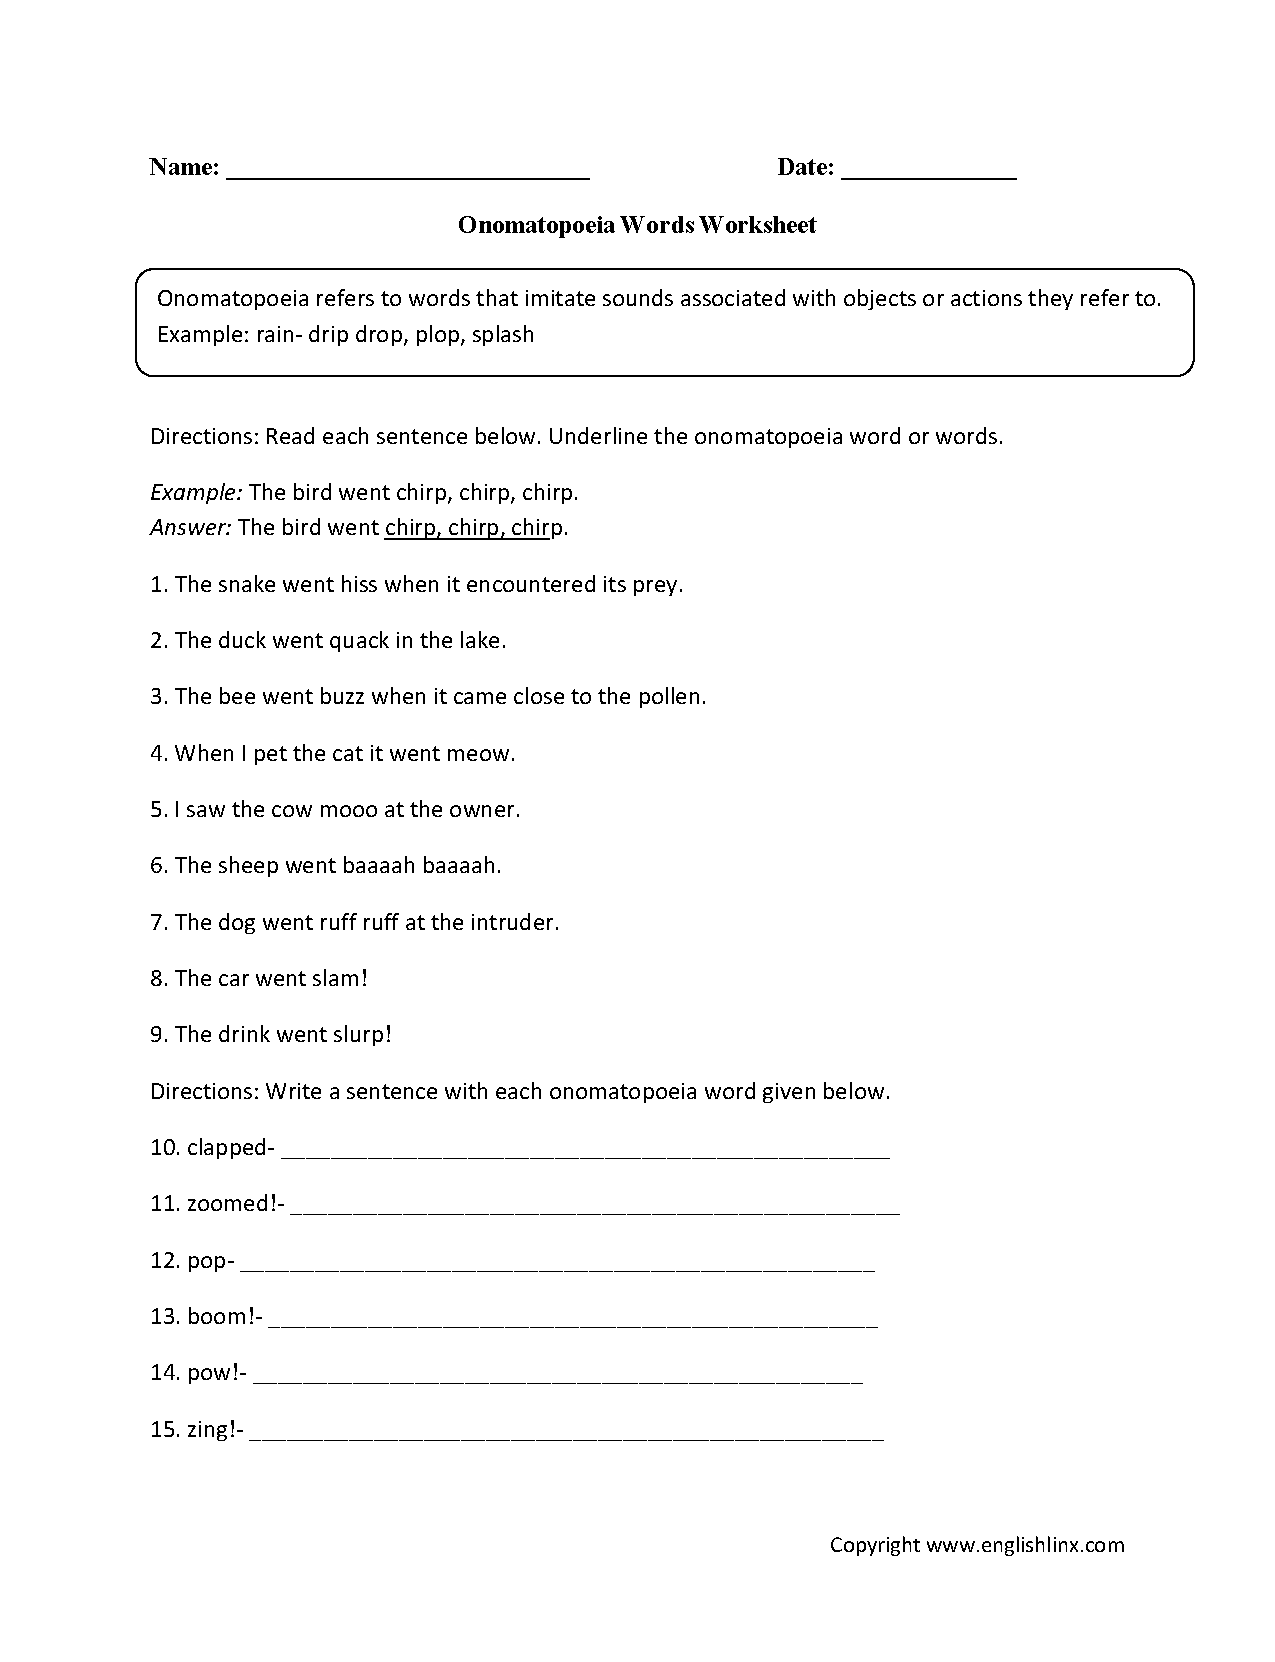 medium resolution of Englishlinx.com   Onomatopoeia Worksheets   Figurative language worksheet